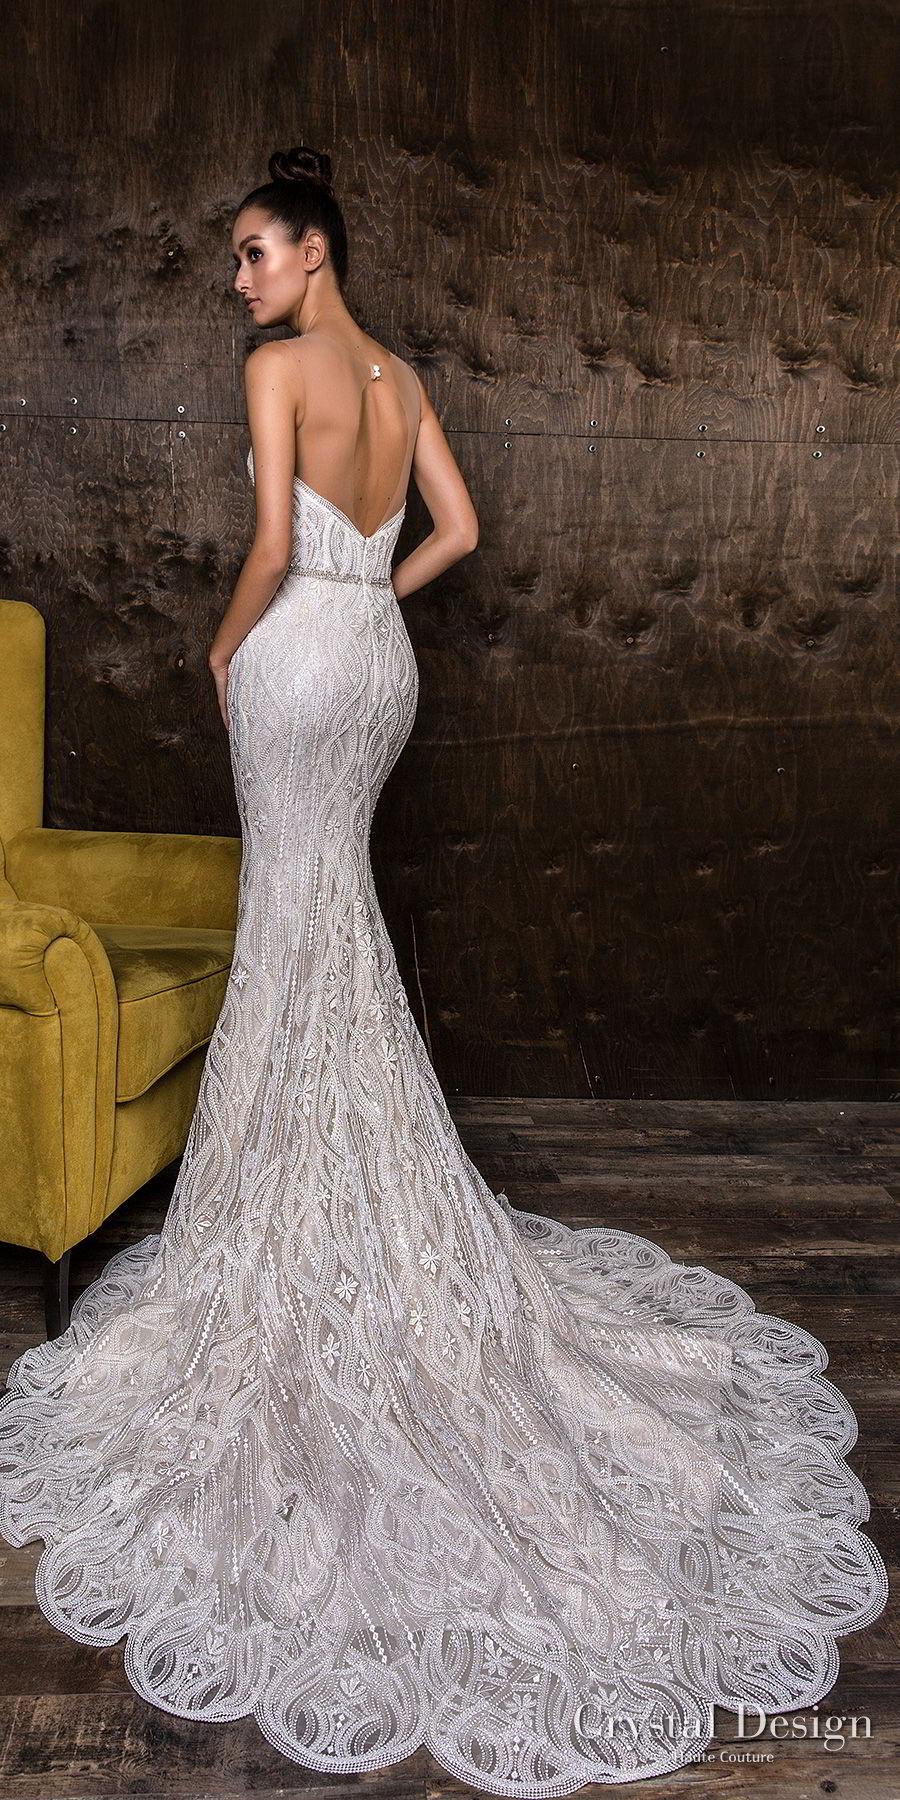 crystal design 2018 strapless sweetheart neckline full embellishment elegant glamor fit and flare sheath wedding dress open back chapel train (djef) bv